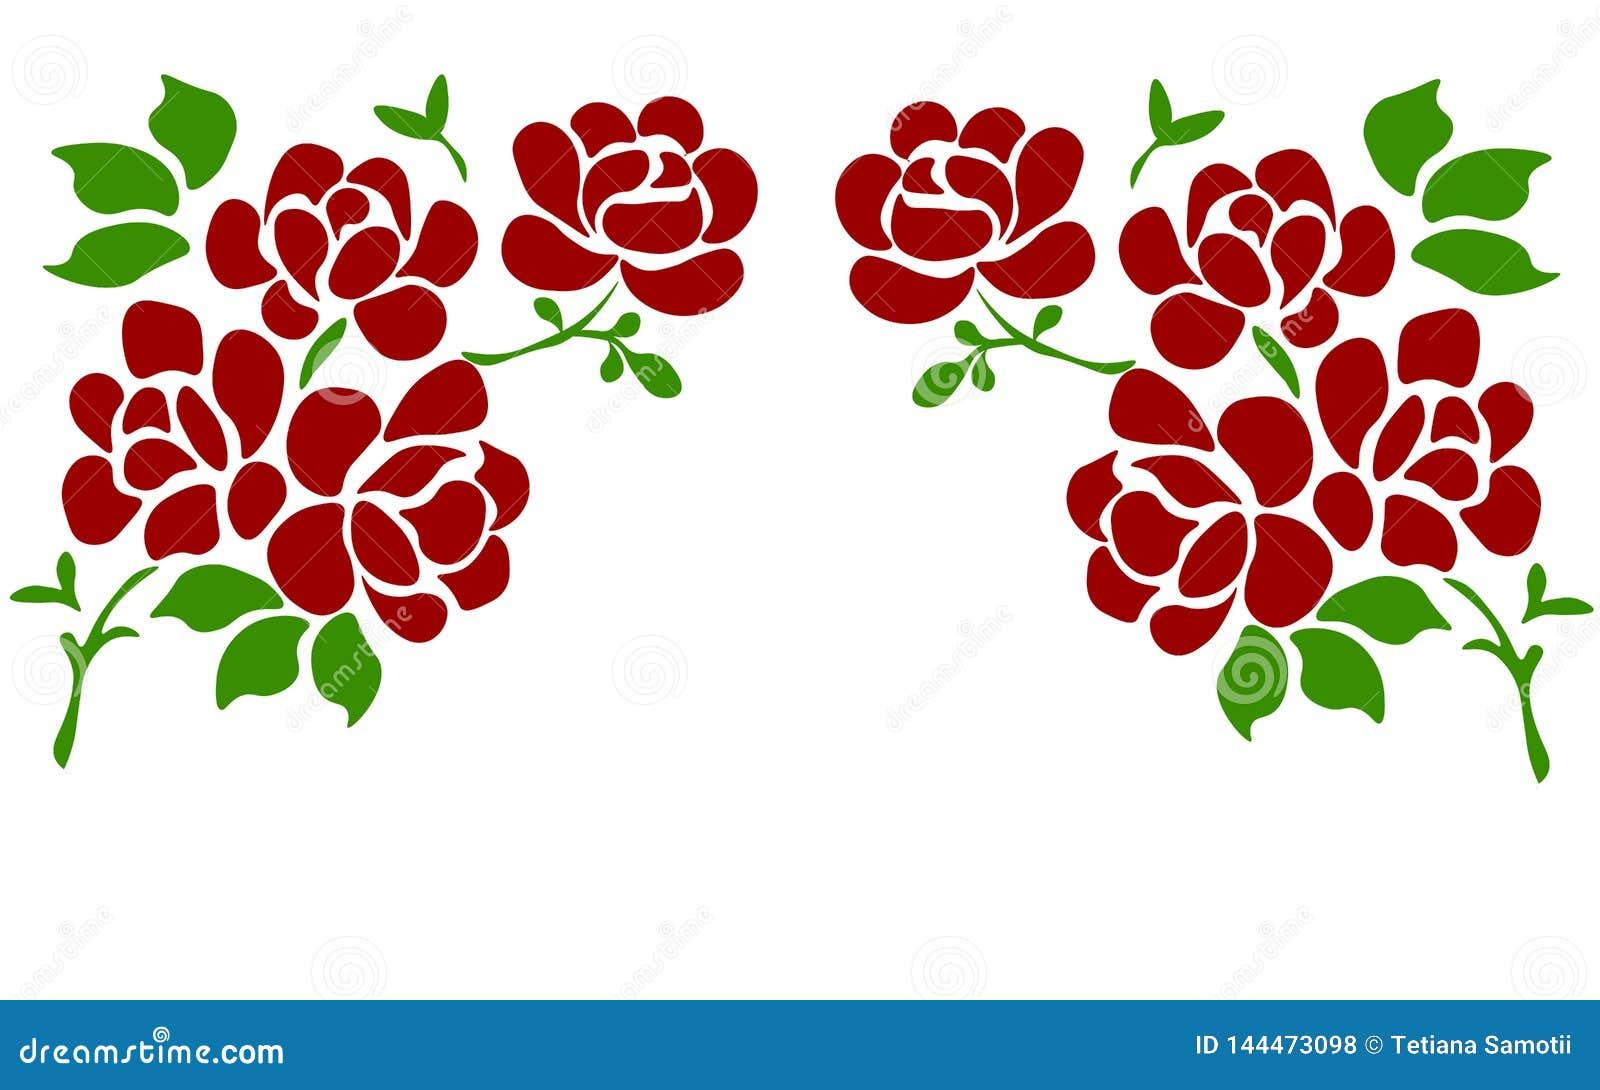 Rosa bonita isolada no branco Aperfei?oe para cart?es do fundo e convites do casamento, anivers?rio, Valentim